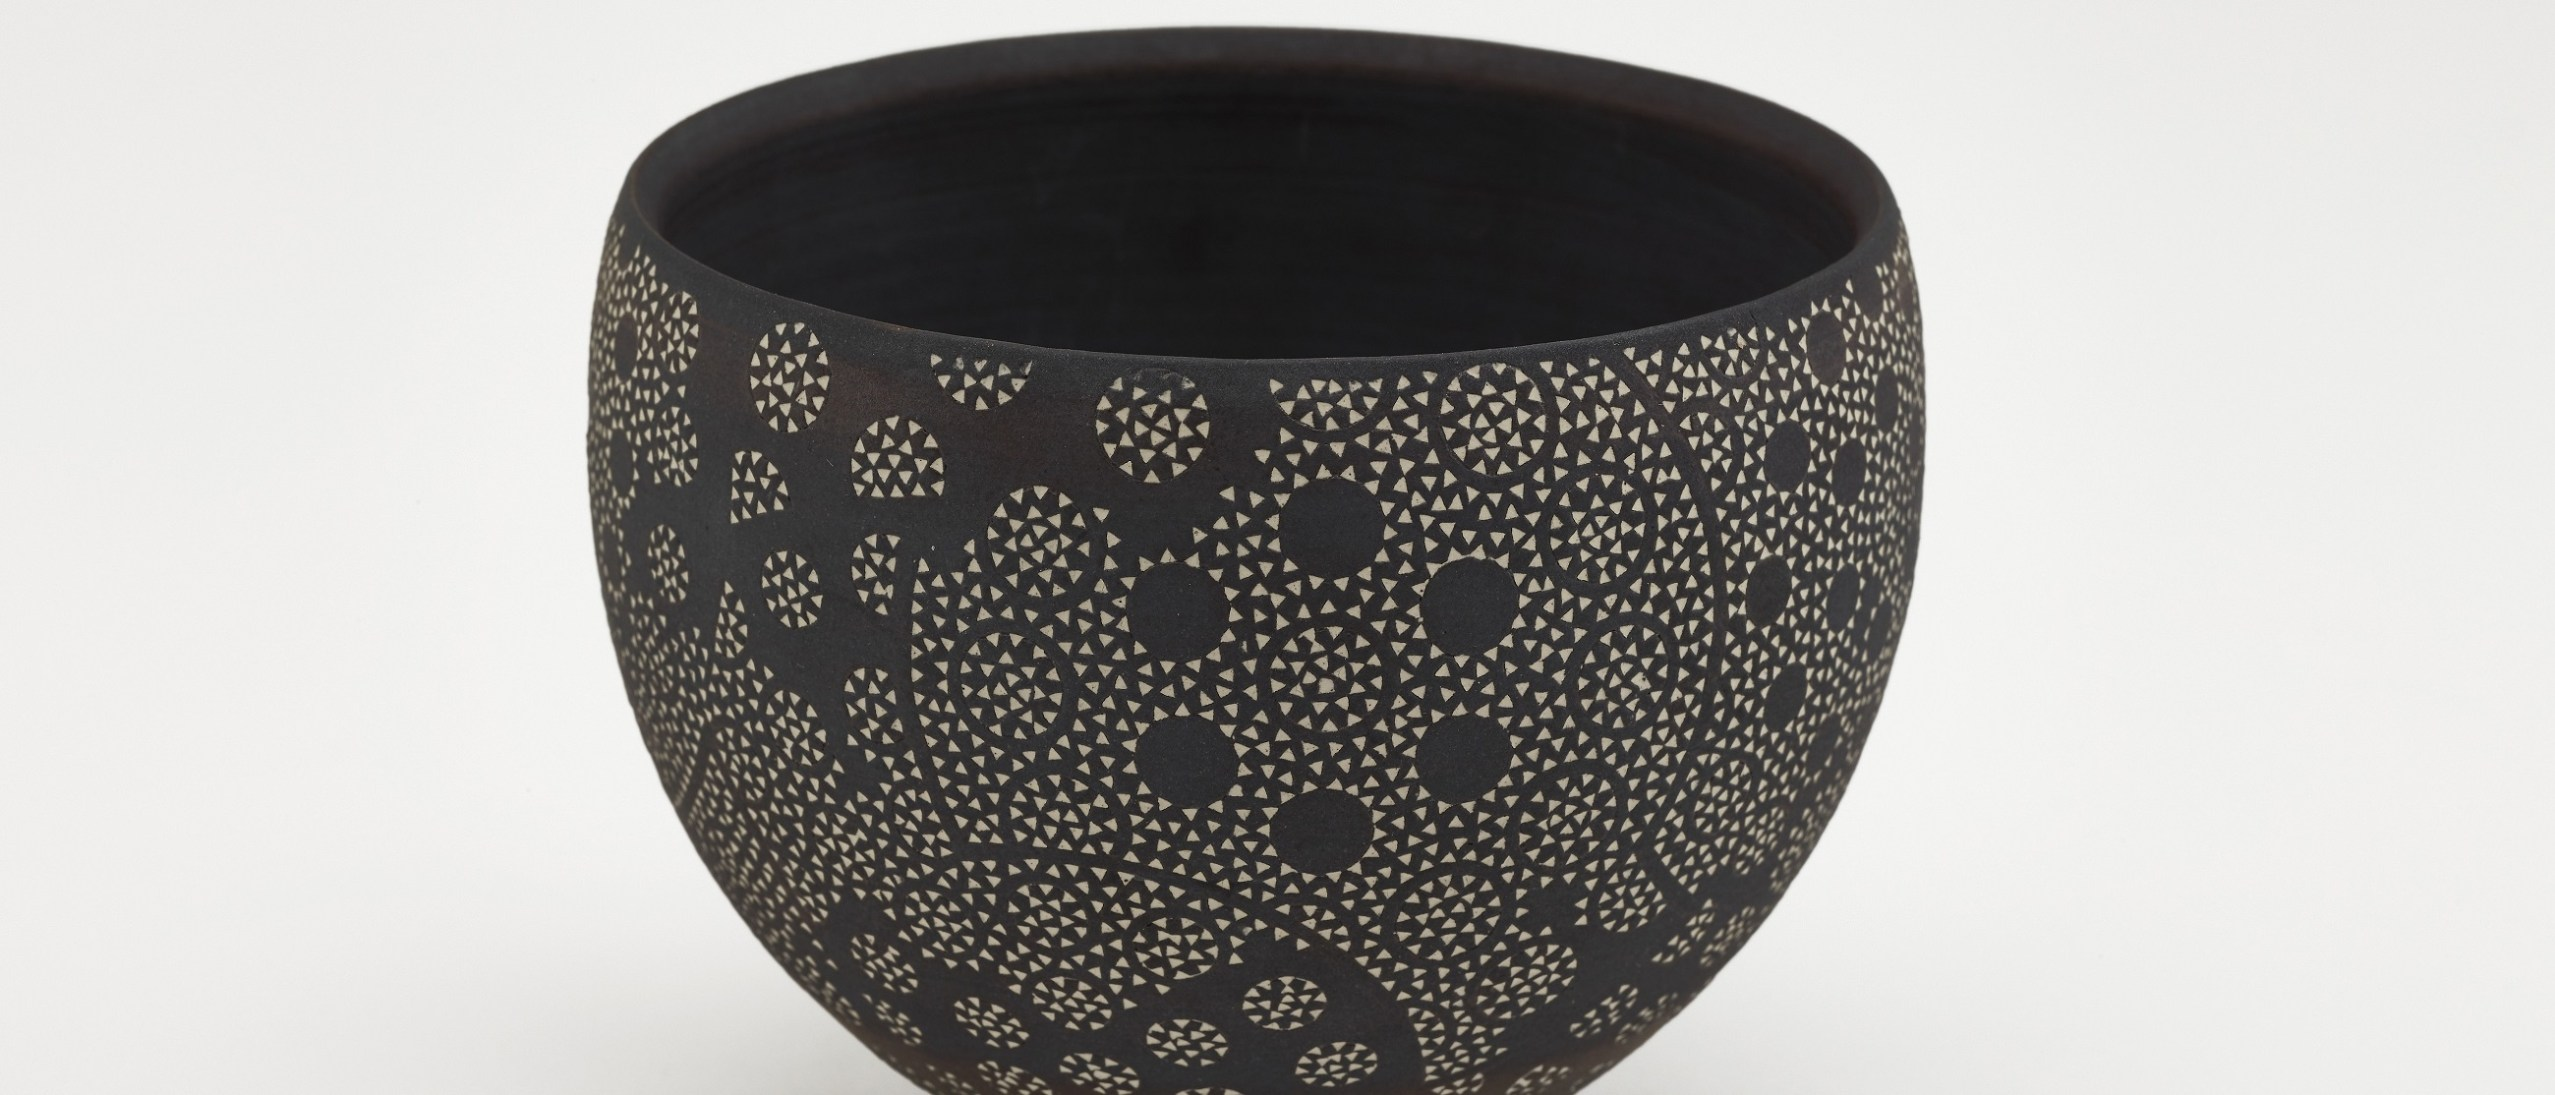 Photo of Bowl; Kitamura Junko (b. 1956); Japan, Kyoto, 1995; Black stoneware with white slip inlay; Gift of Halsey and Alice North; Arthur M. Sackler Gallery S2017.22